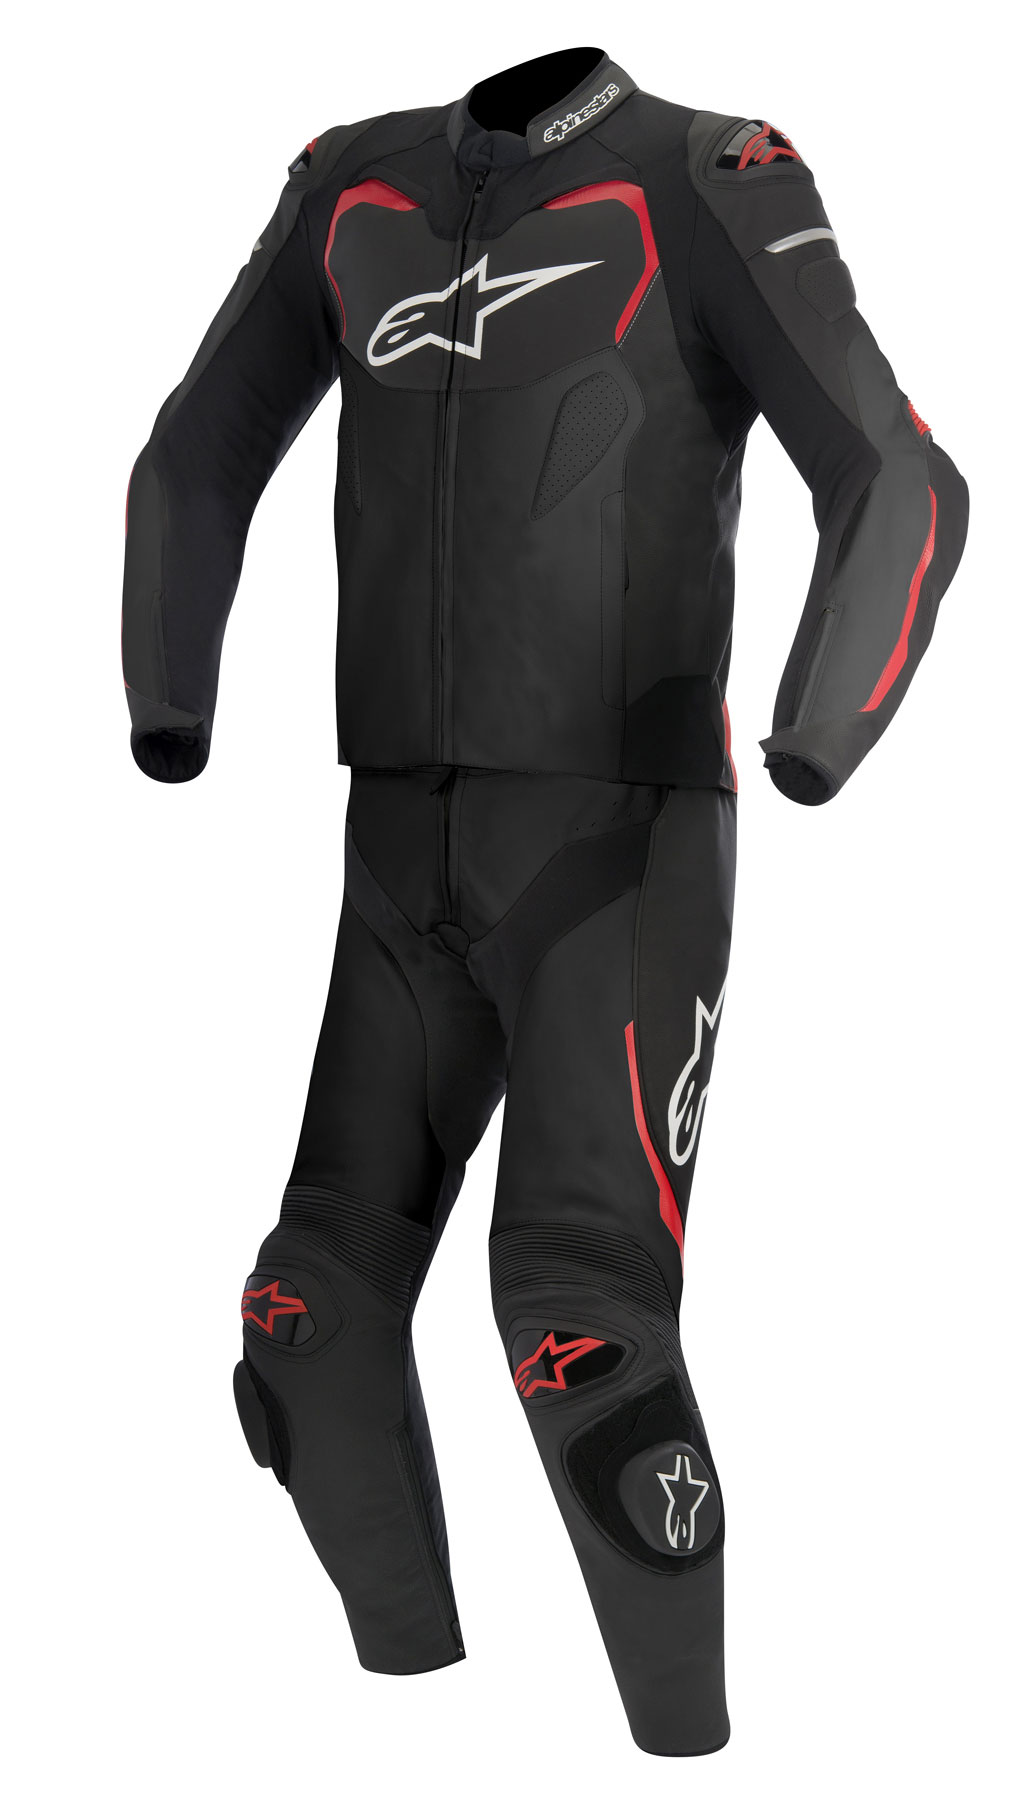 Alpinestars GP PRO 2-Piece Leather Suit (Black/Red)